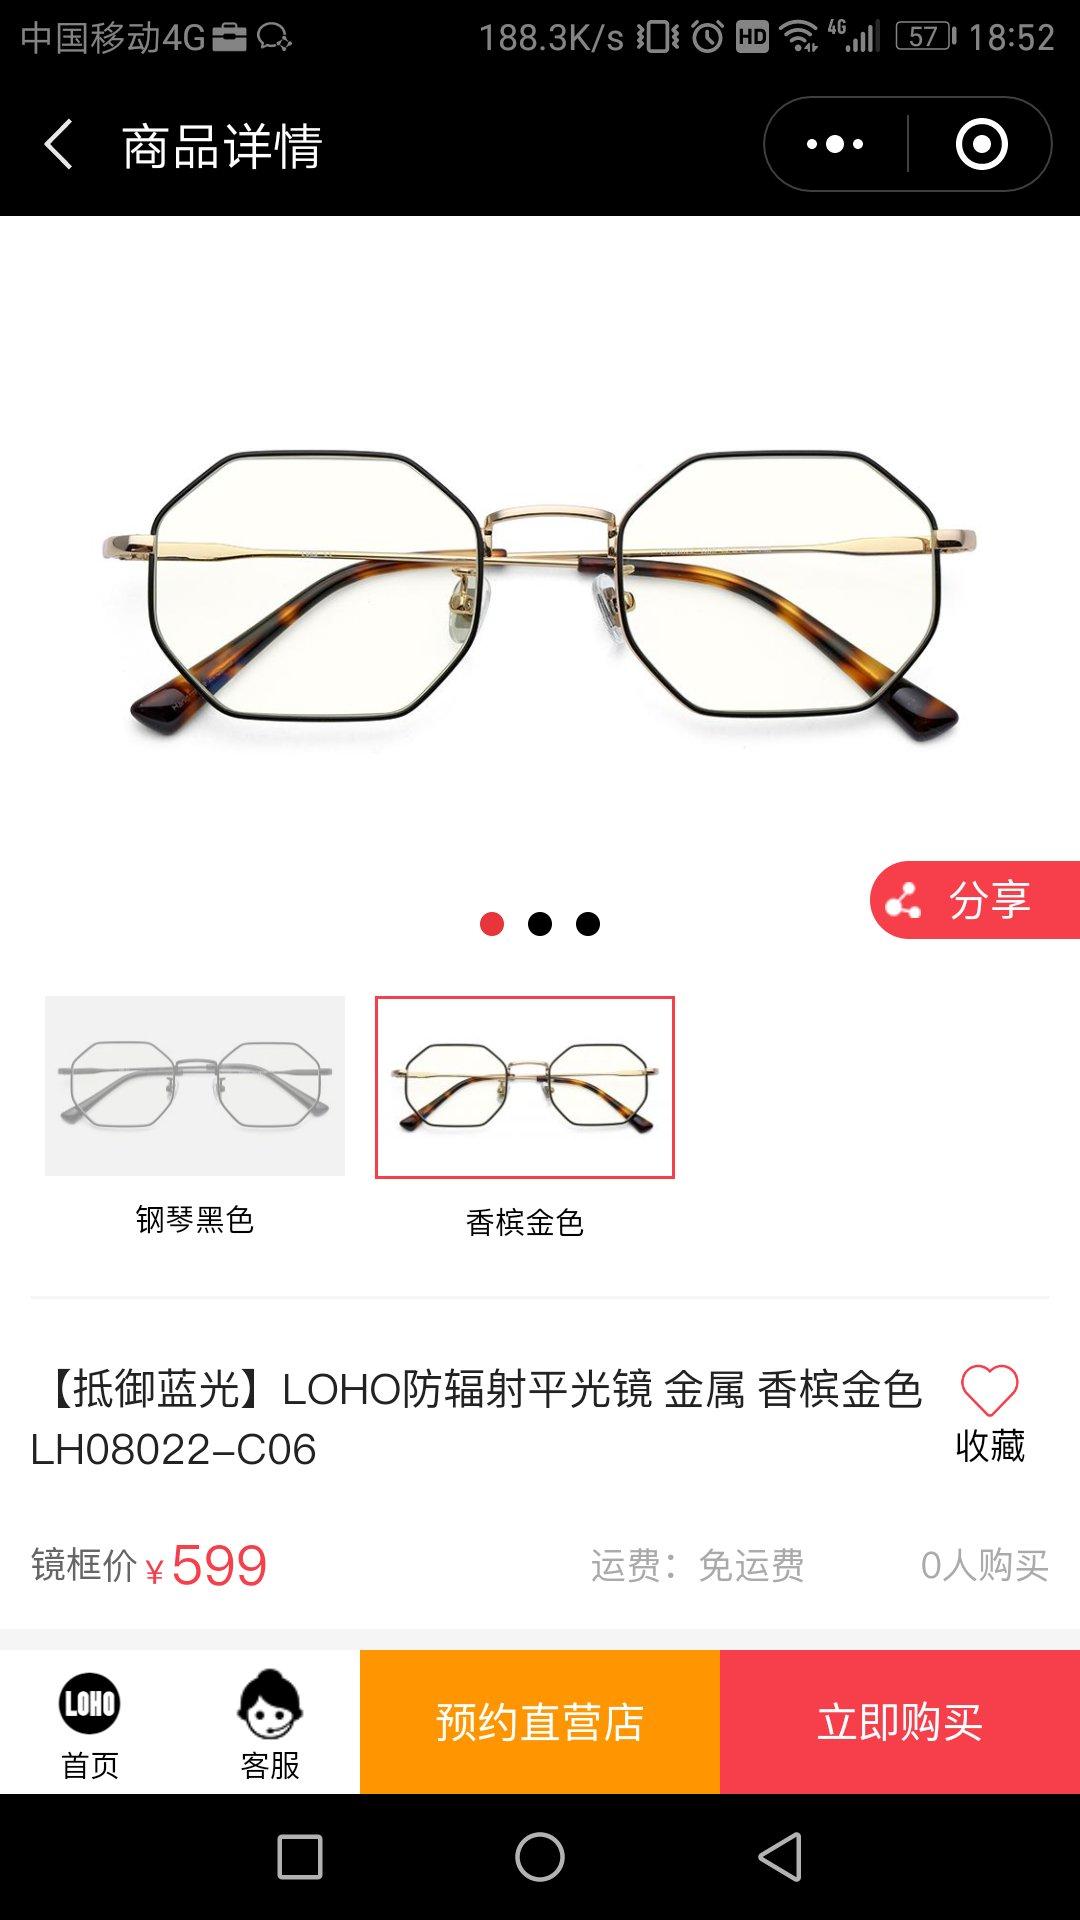 LOHO眼镜生活旗舰店